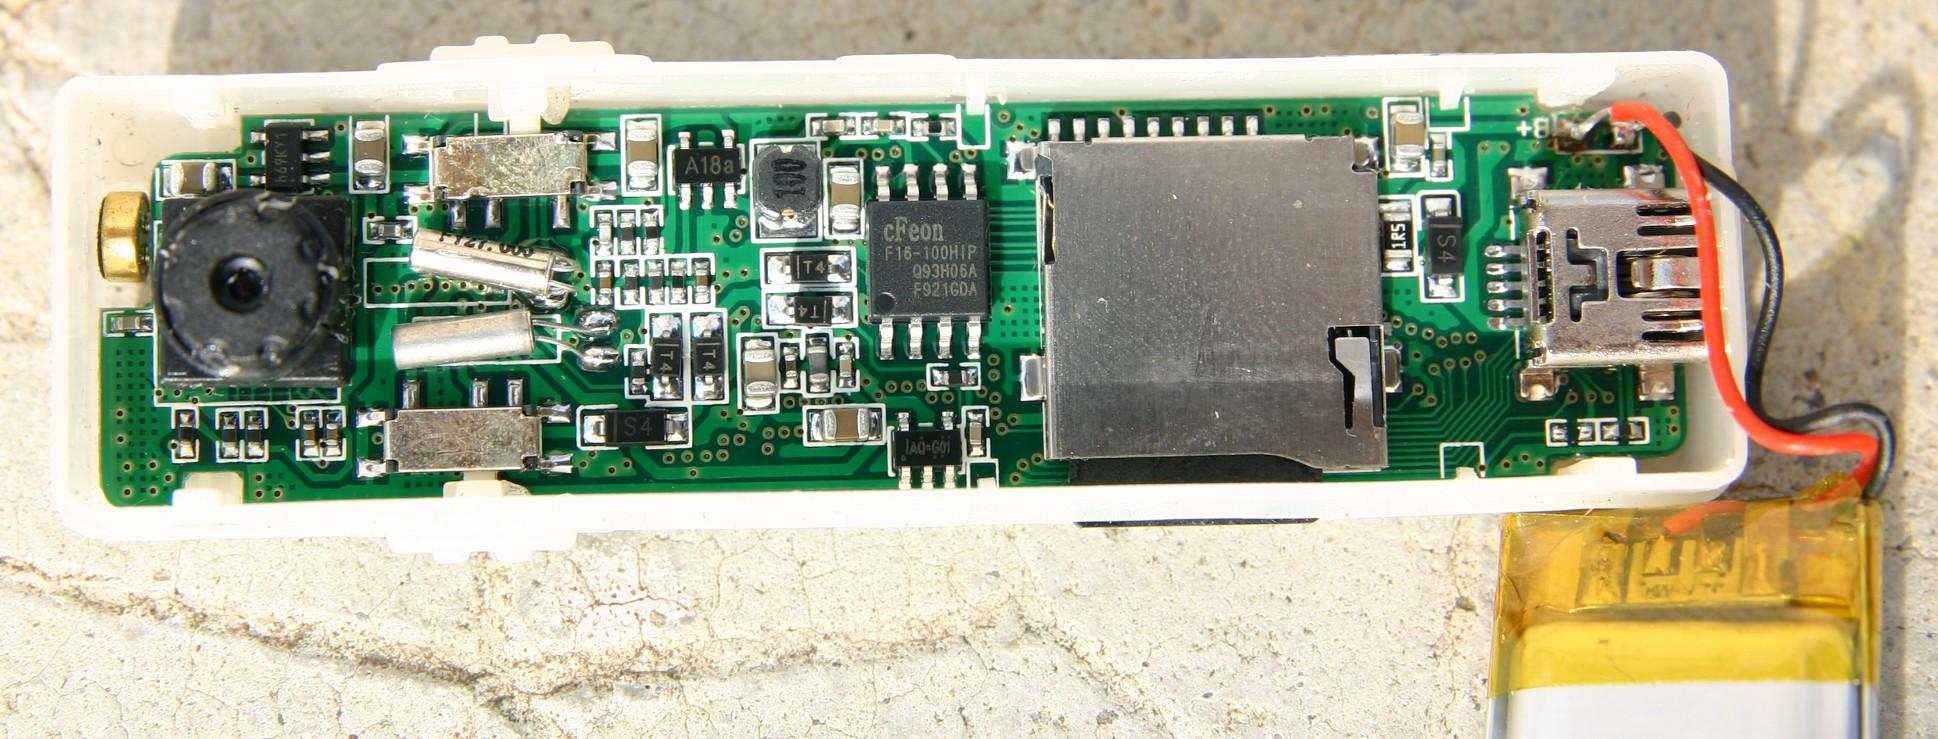 tear down and hacking around gumpack camera on usb web camera wiring diagram